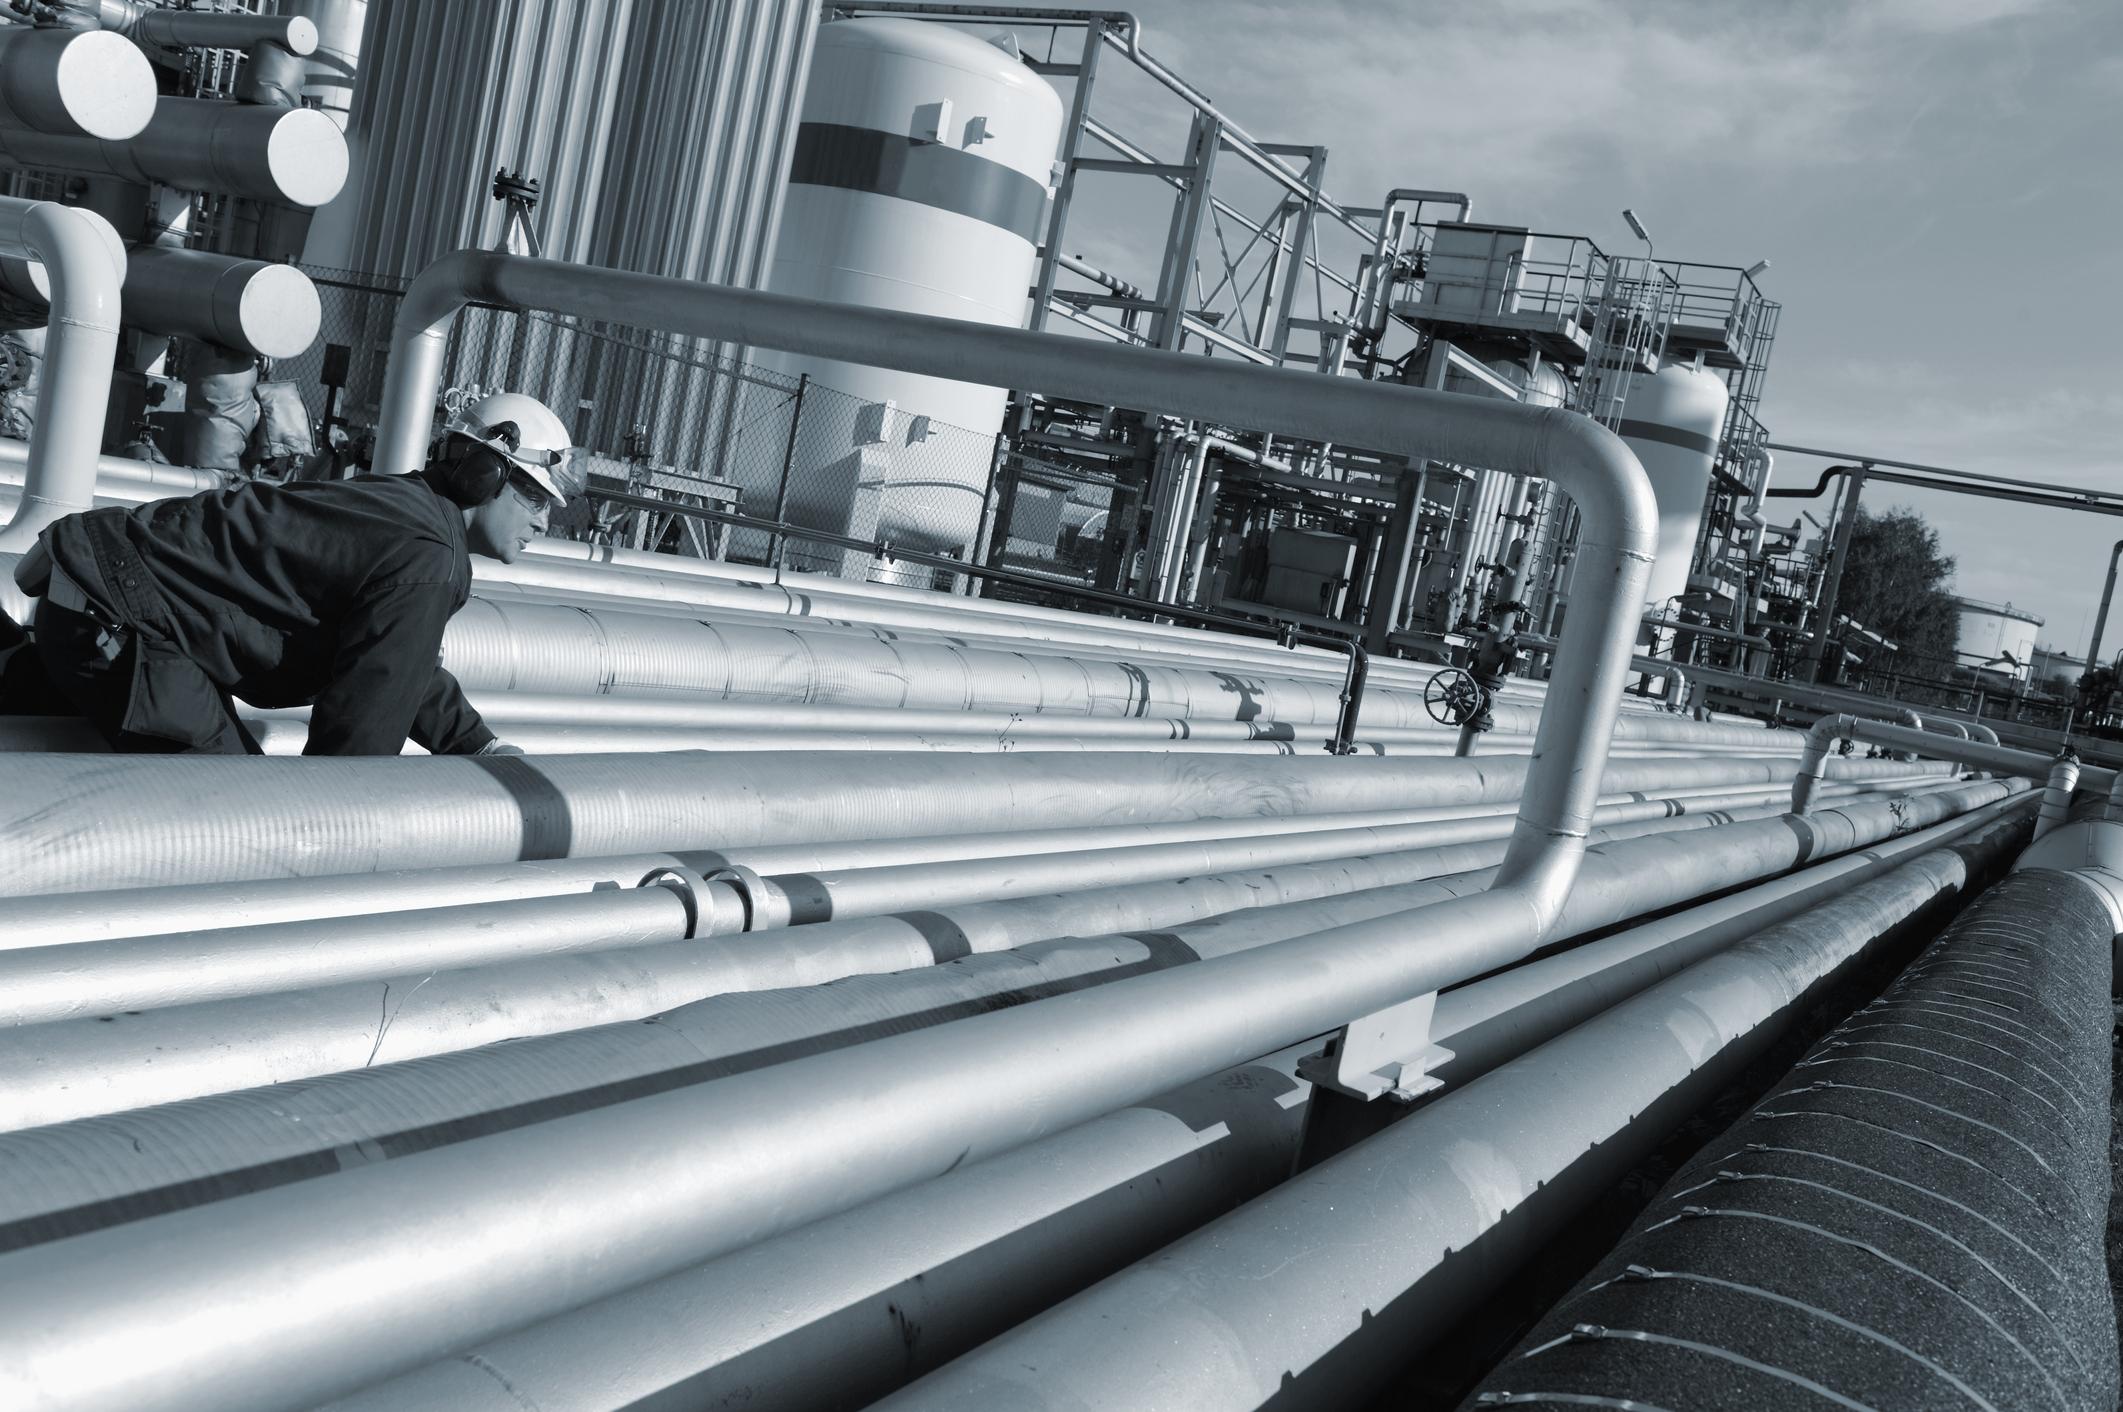 Worker inspecting pipelines.